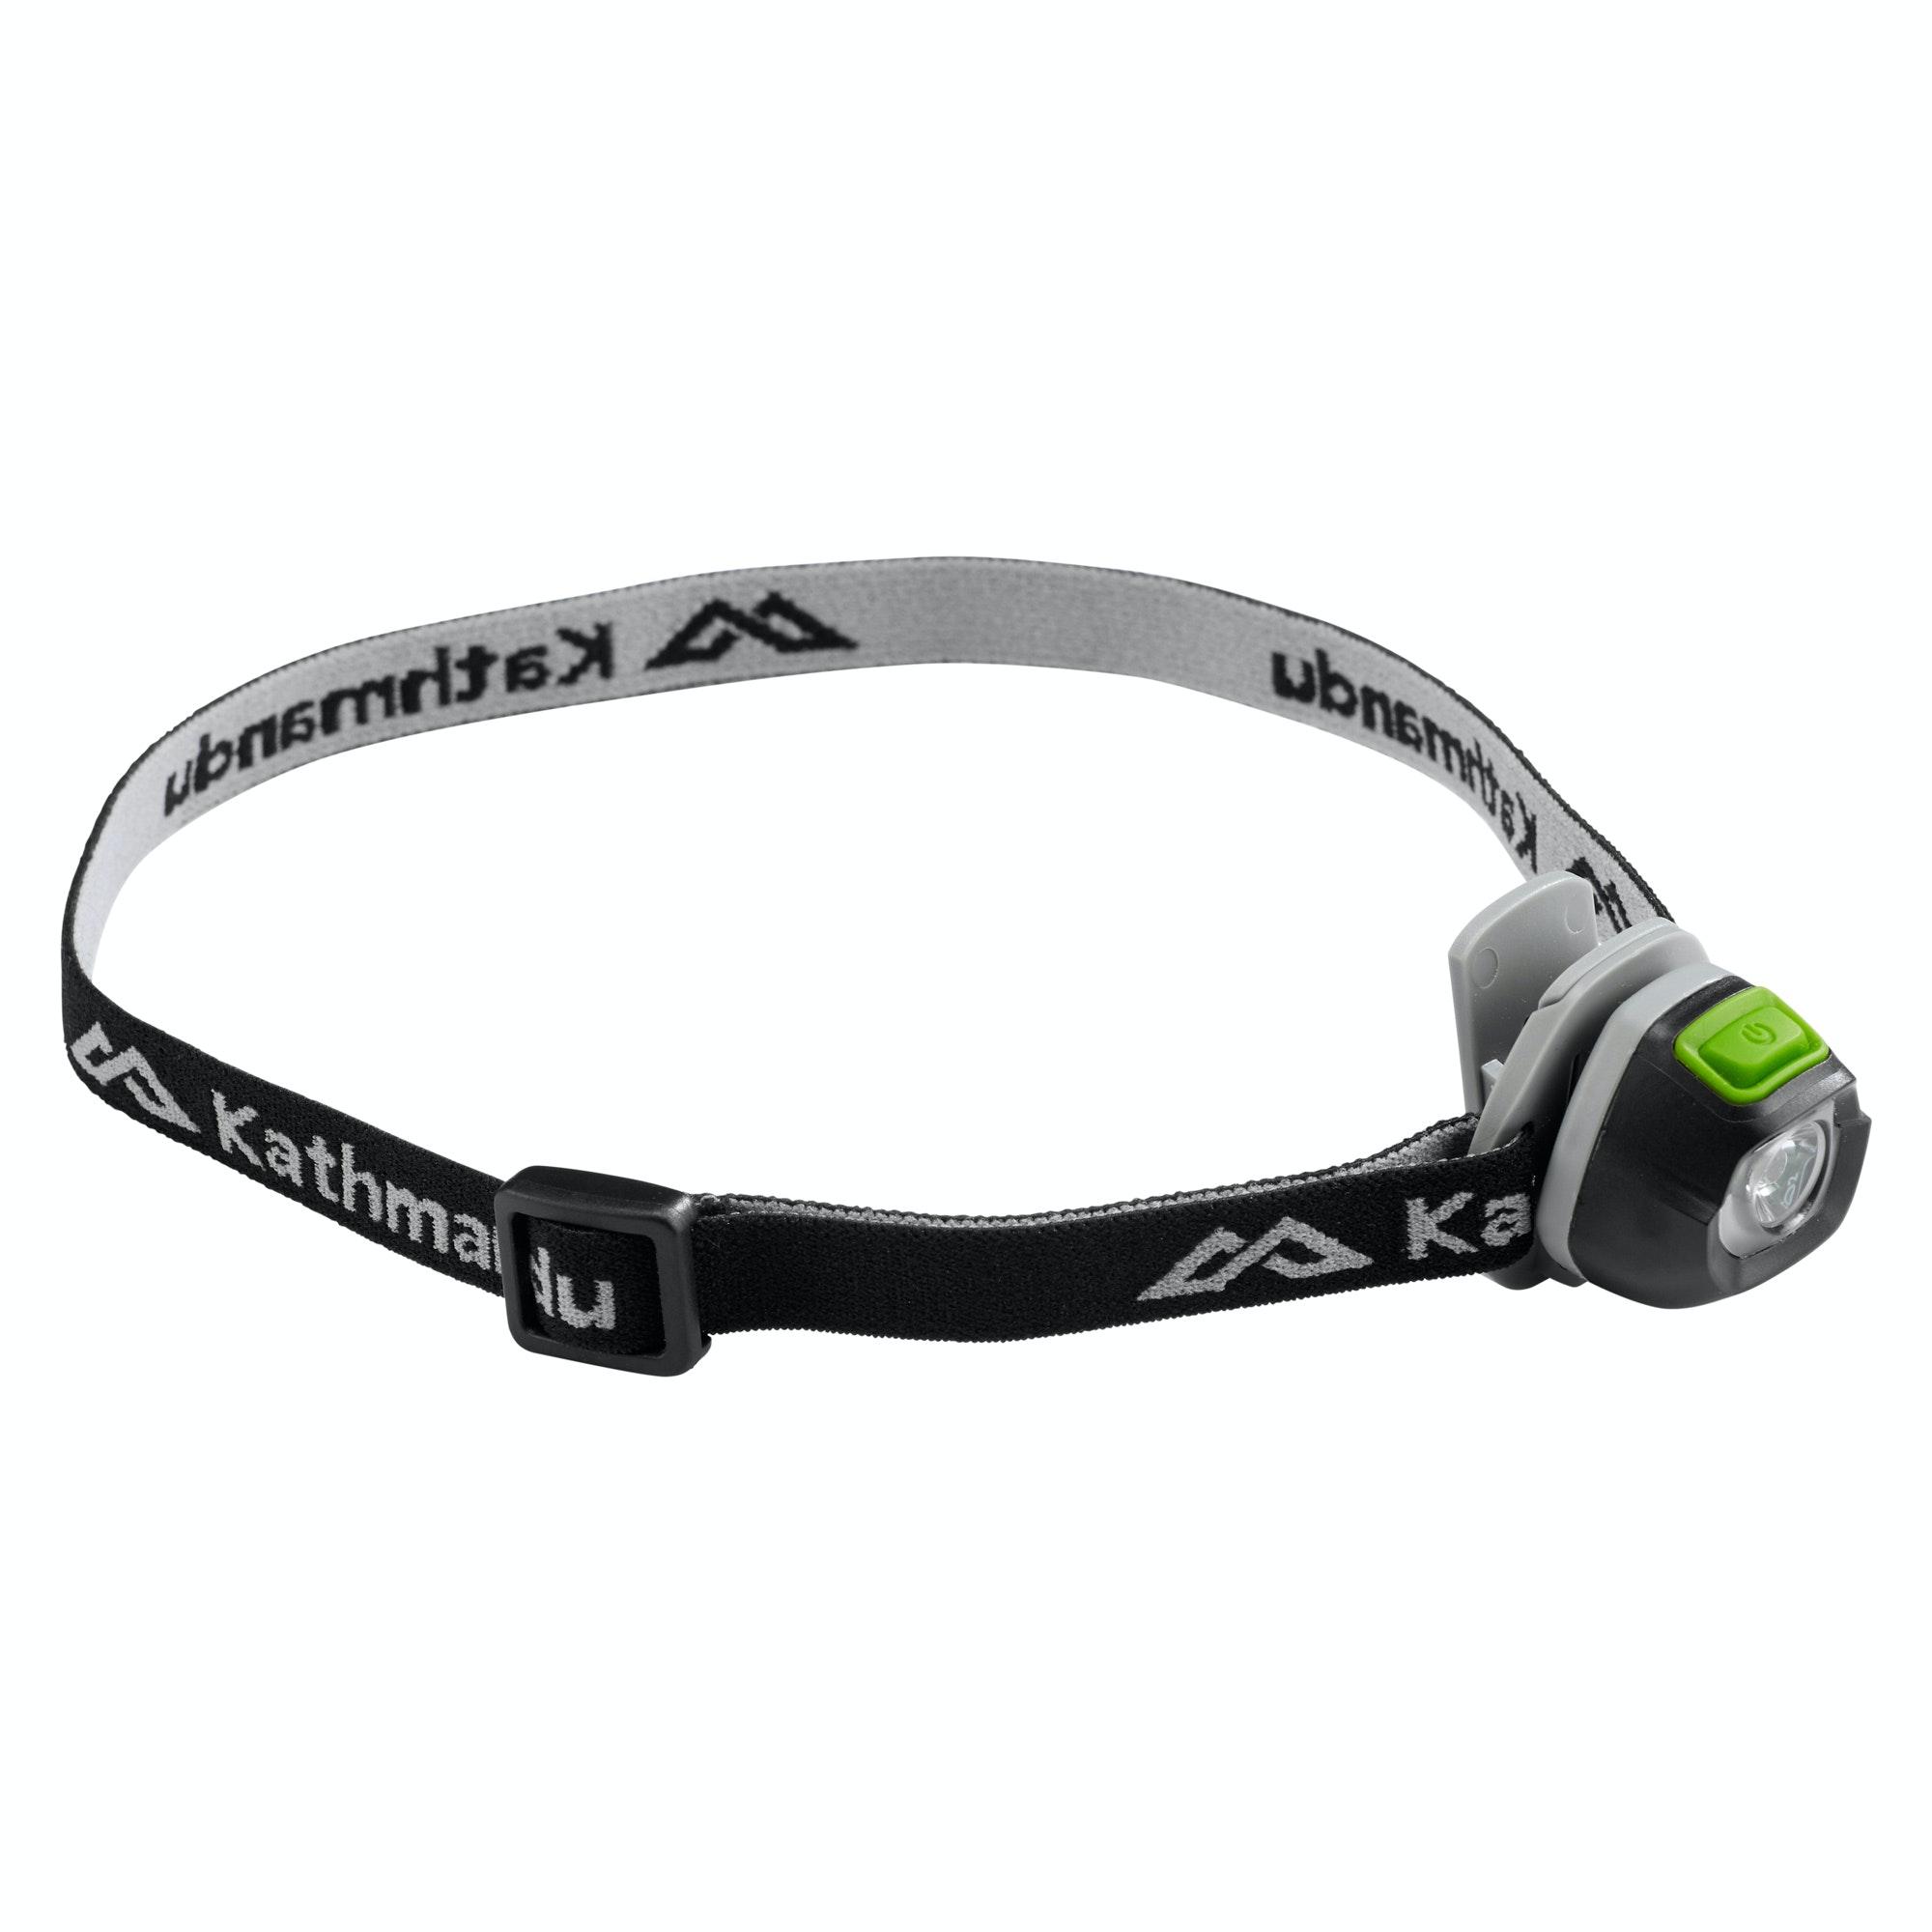 Kathmandu-Robin-14-LED-Light-Adjustable-Tilting-Travel-Camping-Head-Torch